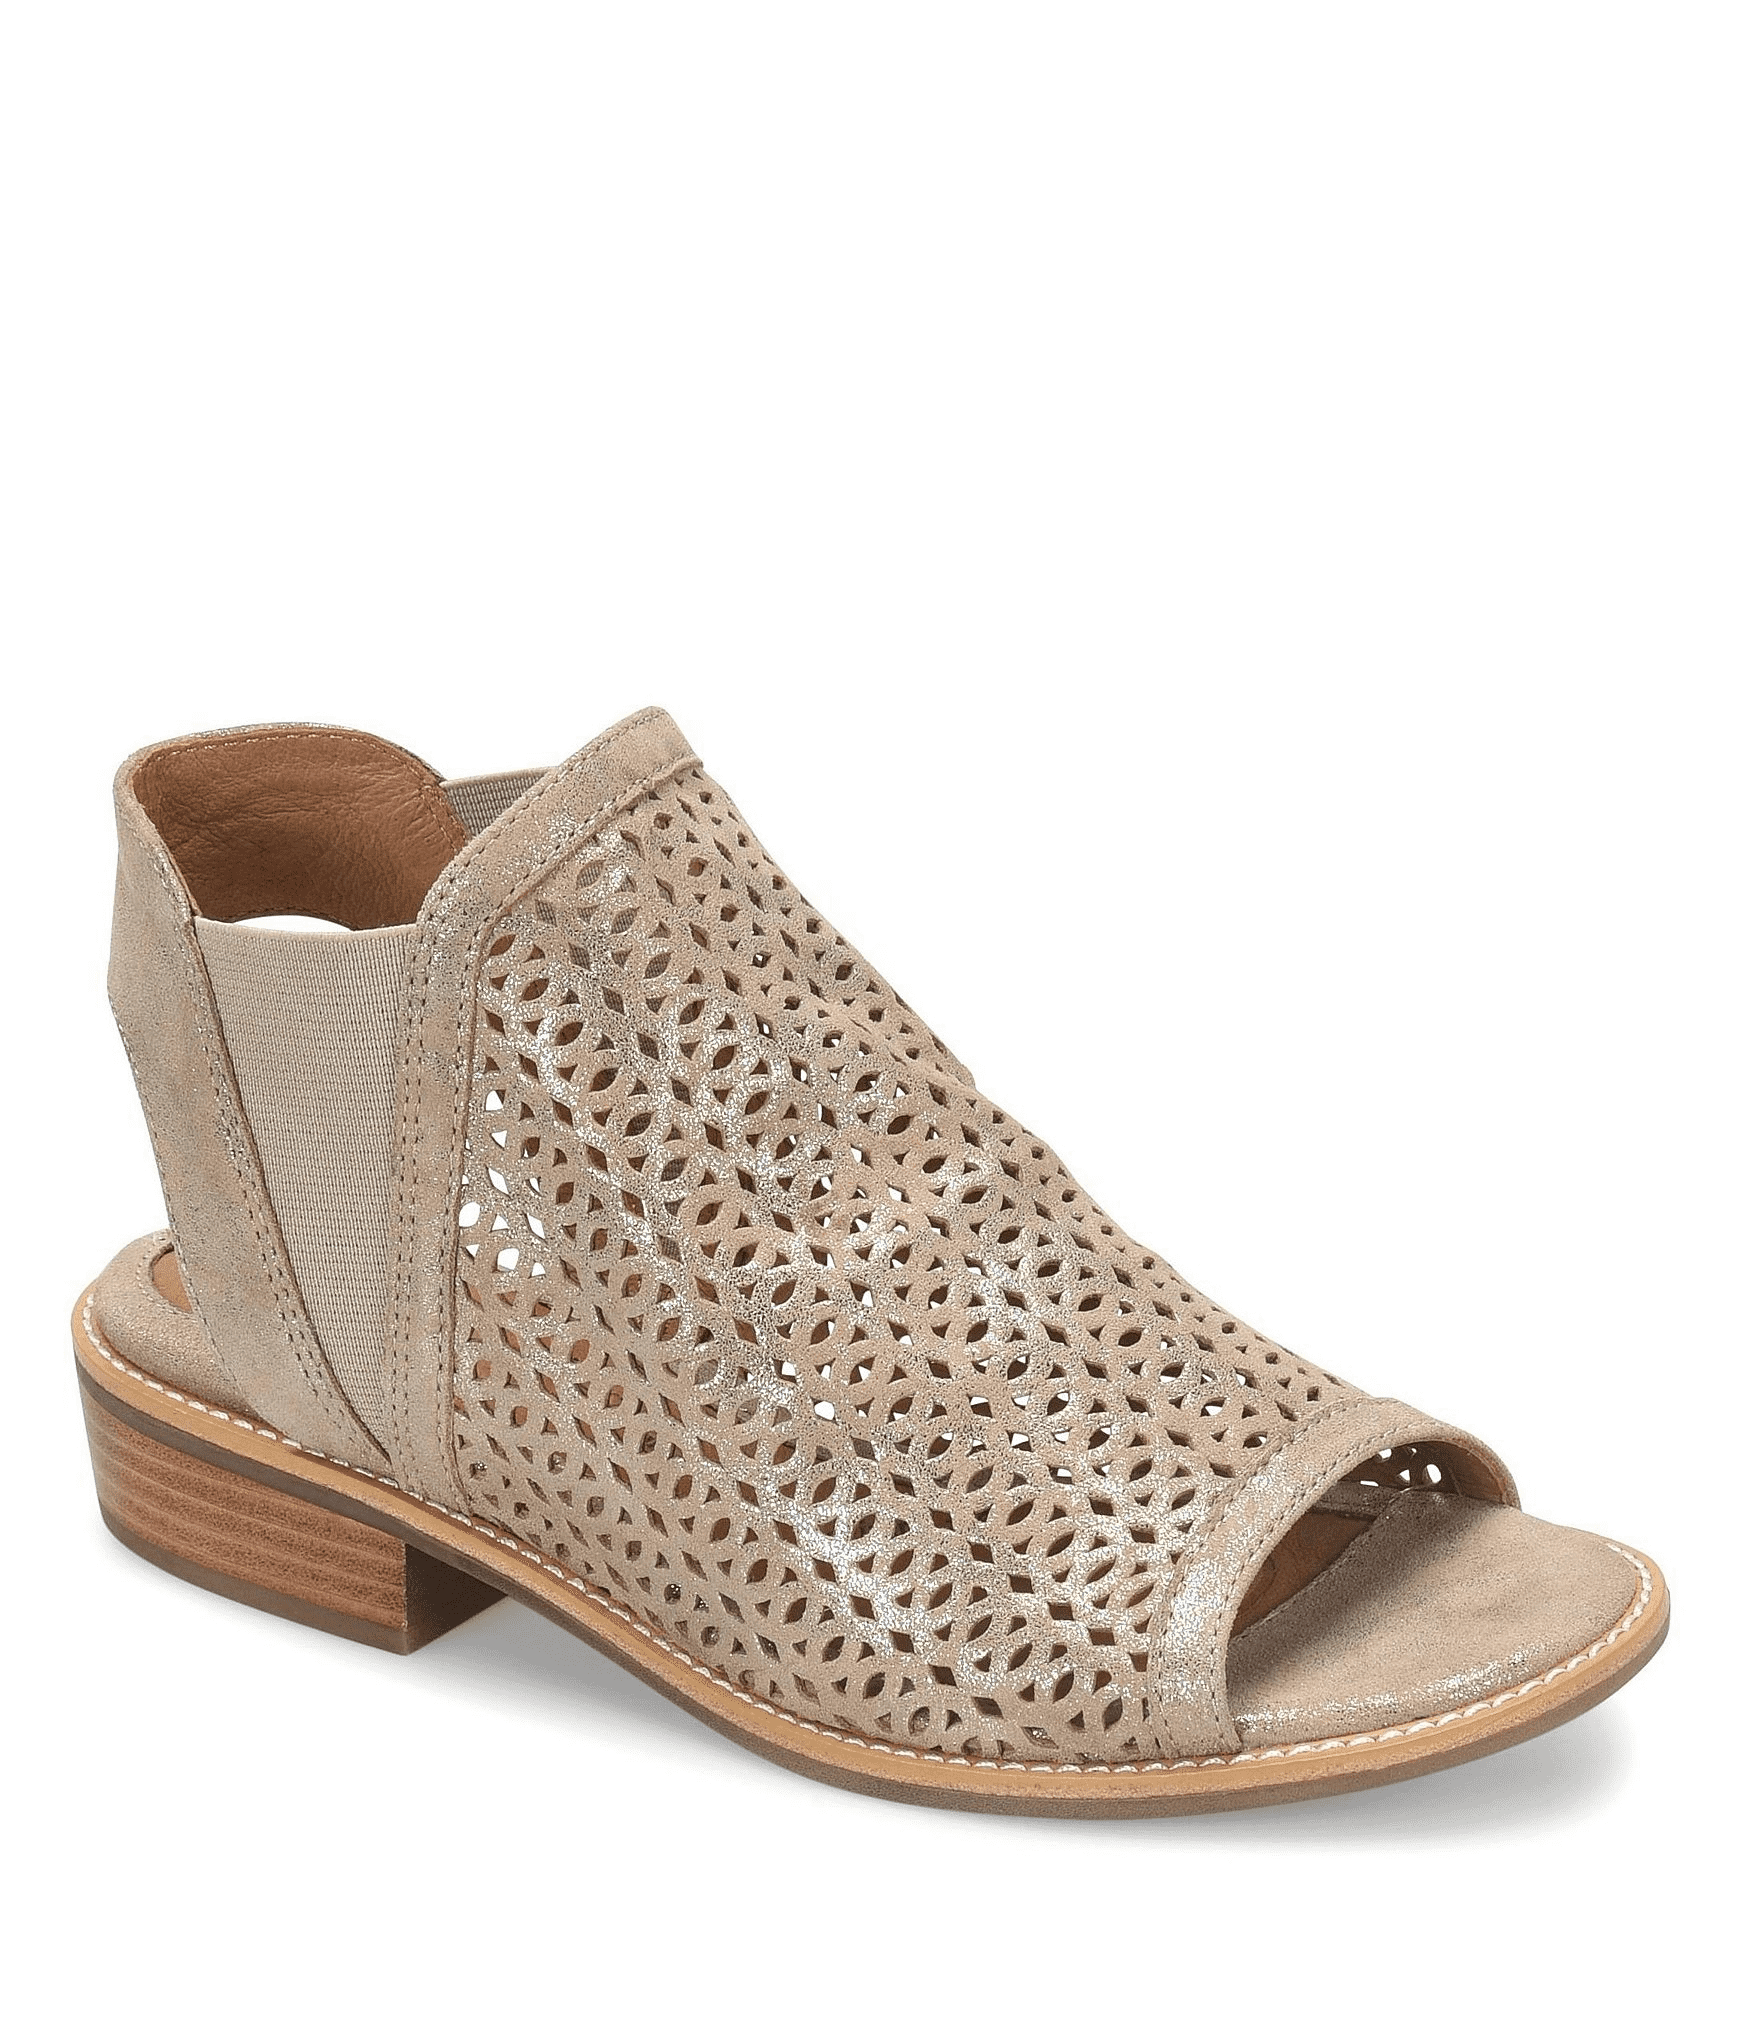 Sofft Shoe Company Sofft Nalda - Anthracite